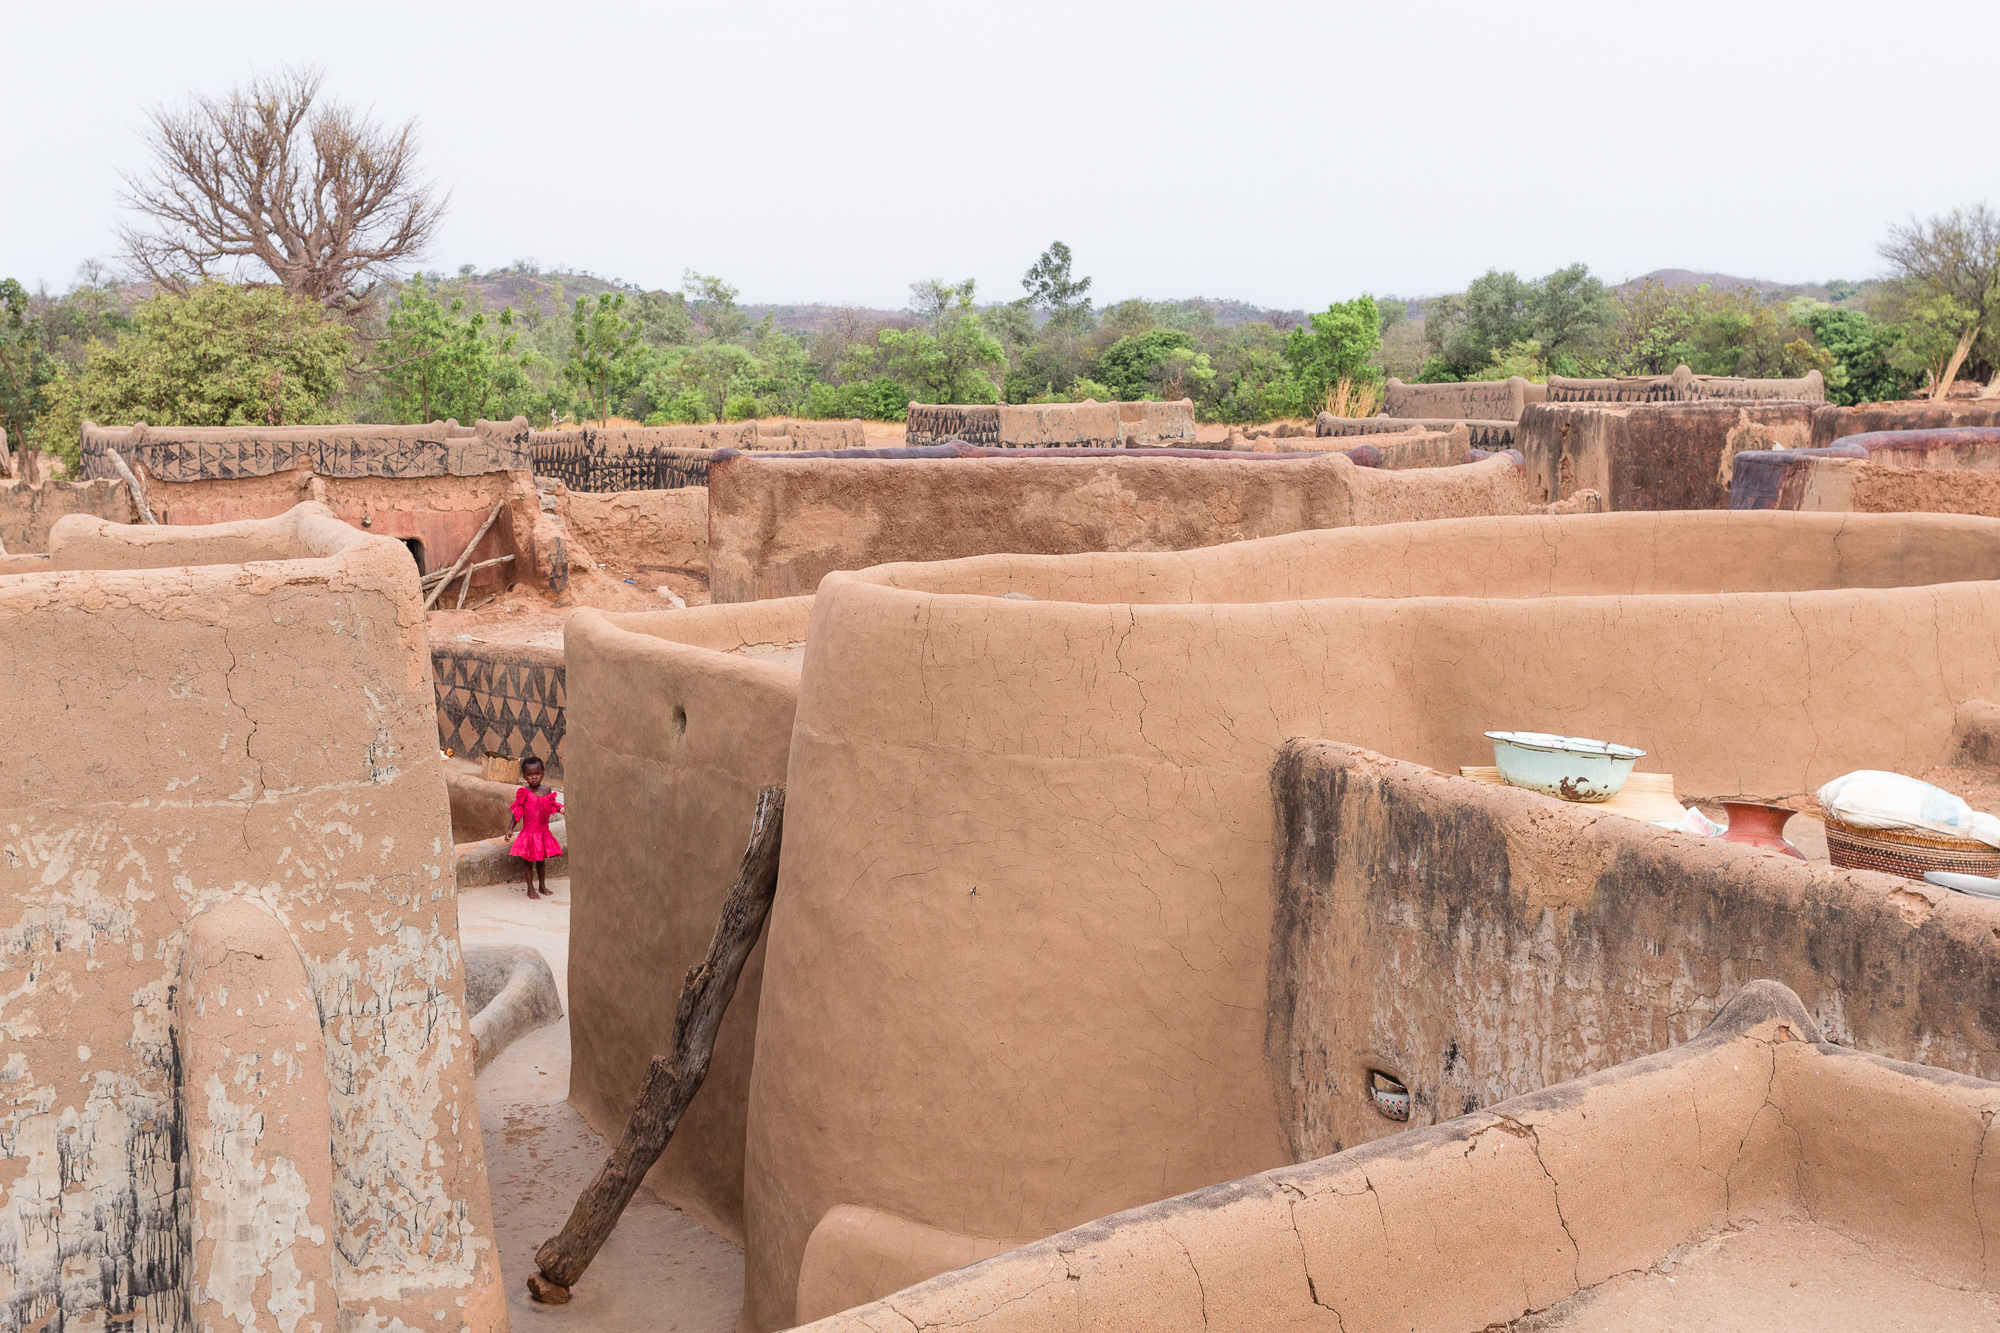 Les cases de terre du village de Tangassogo vues d'un toit, Burkina Faso